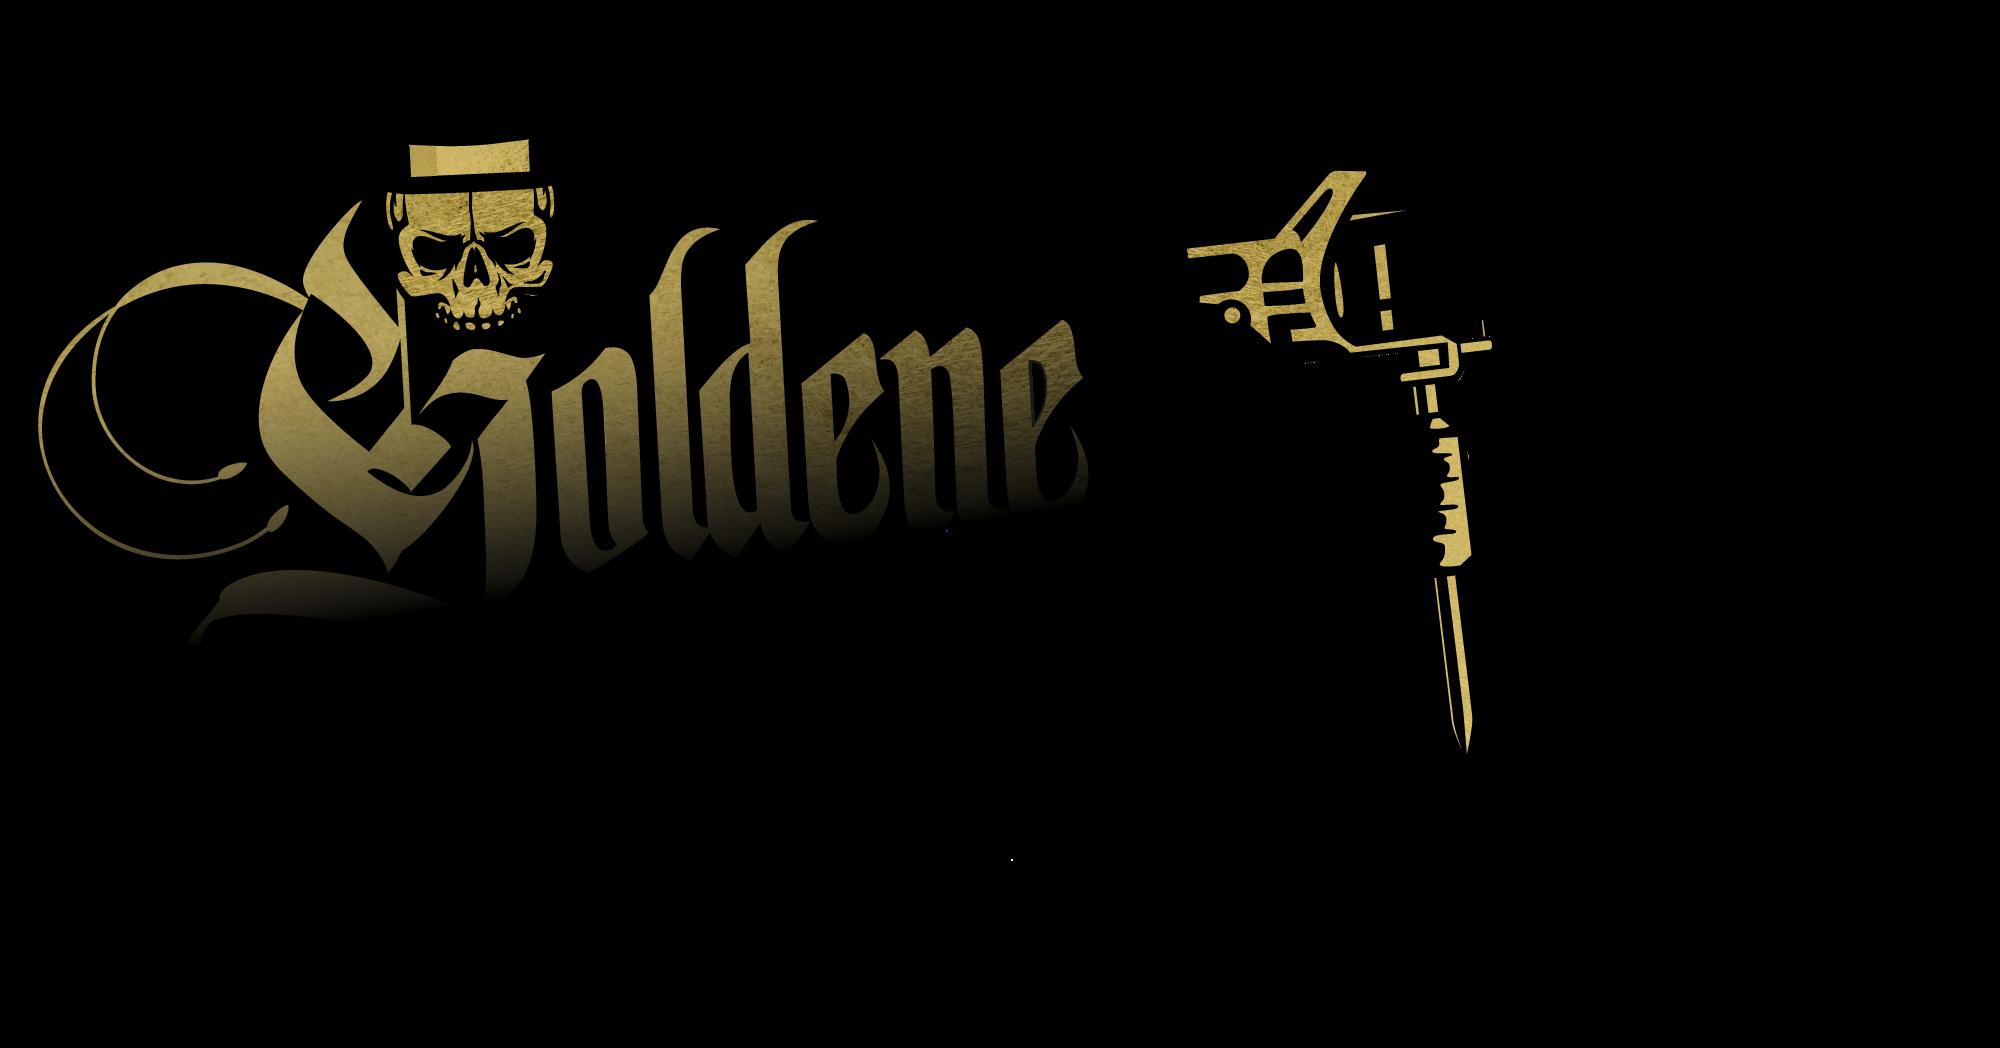 Goldene Nadel Marburg